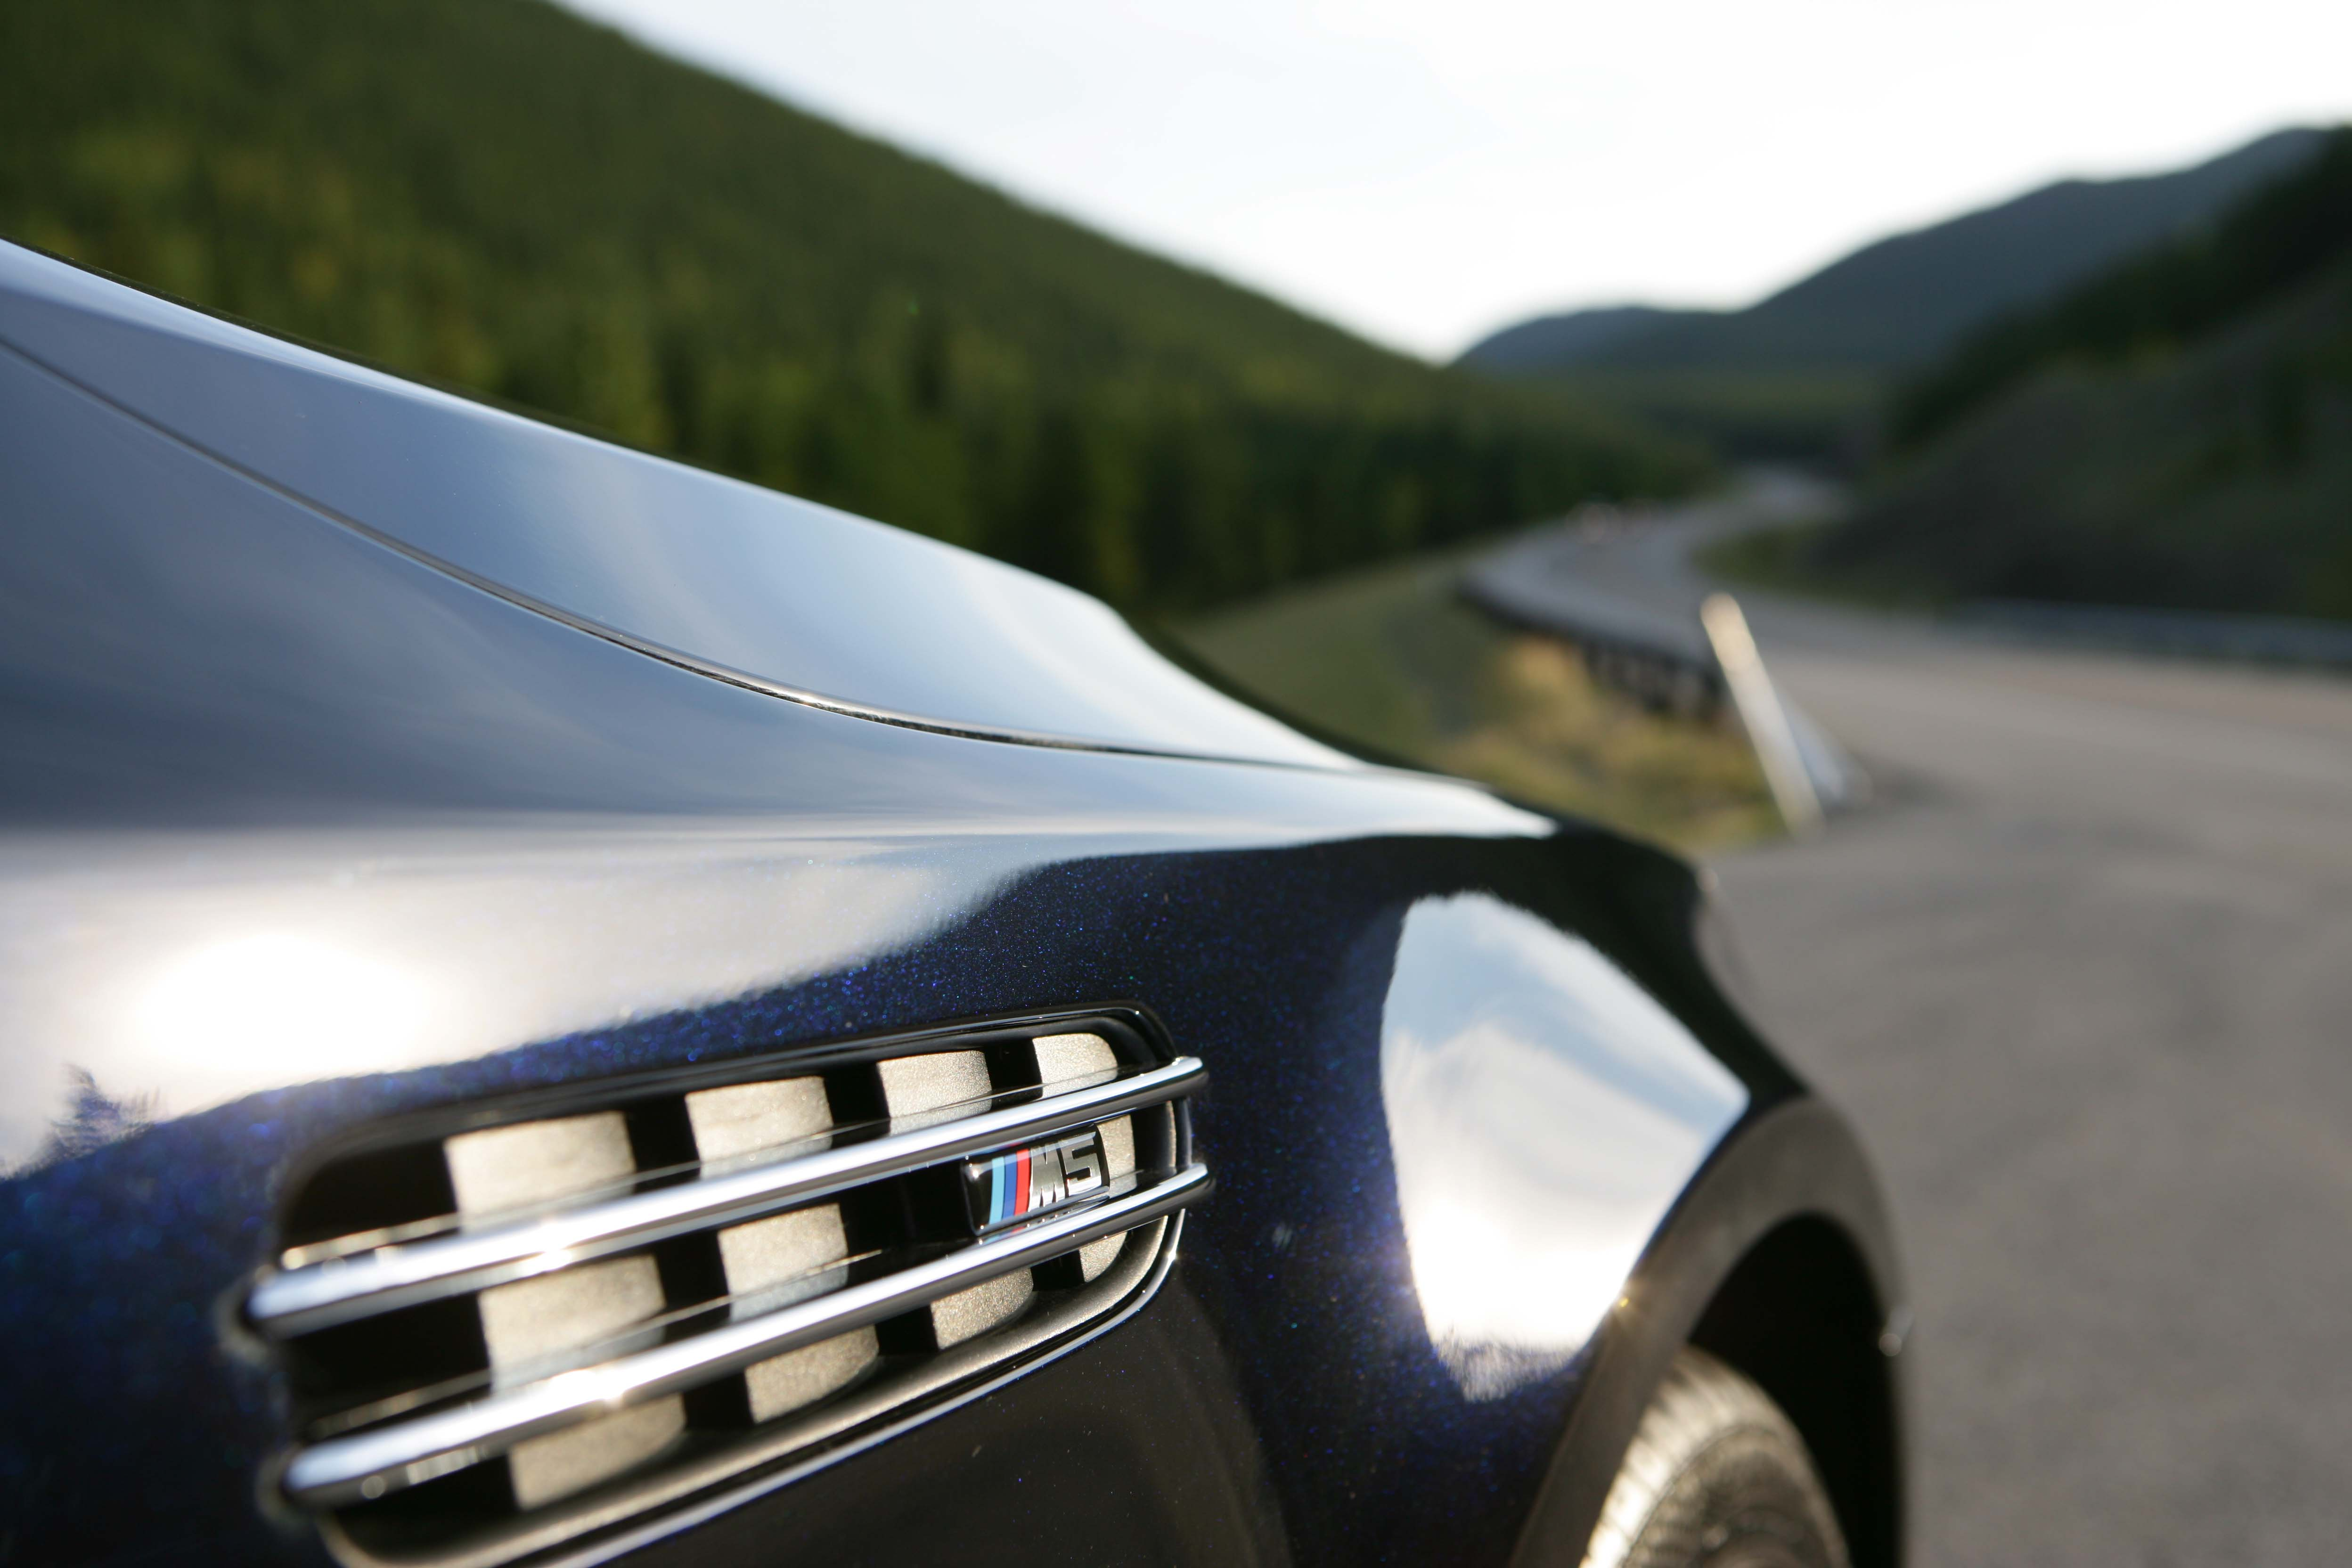 Azurite Black (exterior individual color)-26074d1158100152-s6-mash-azurite-black-individual-interior-platinum-m5-006s.jpg